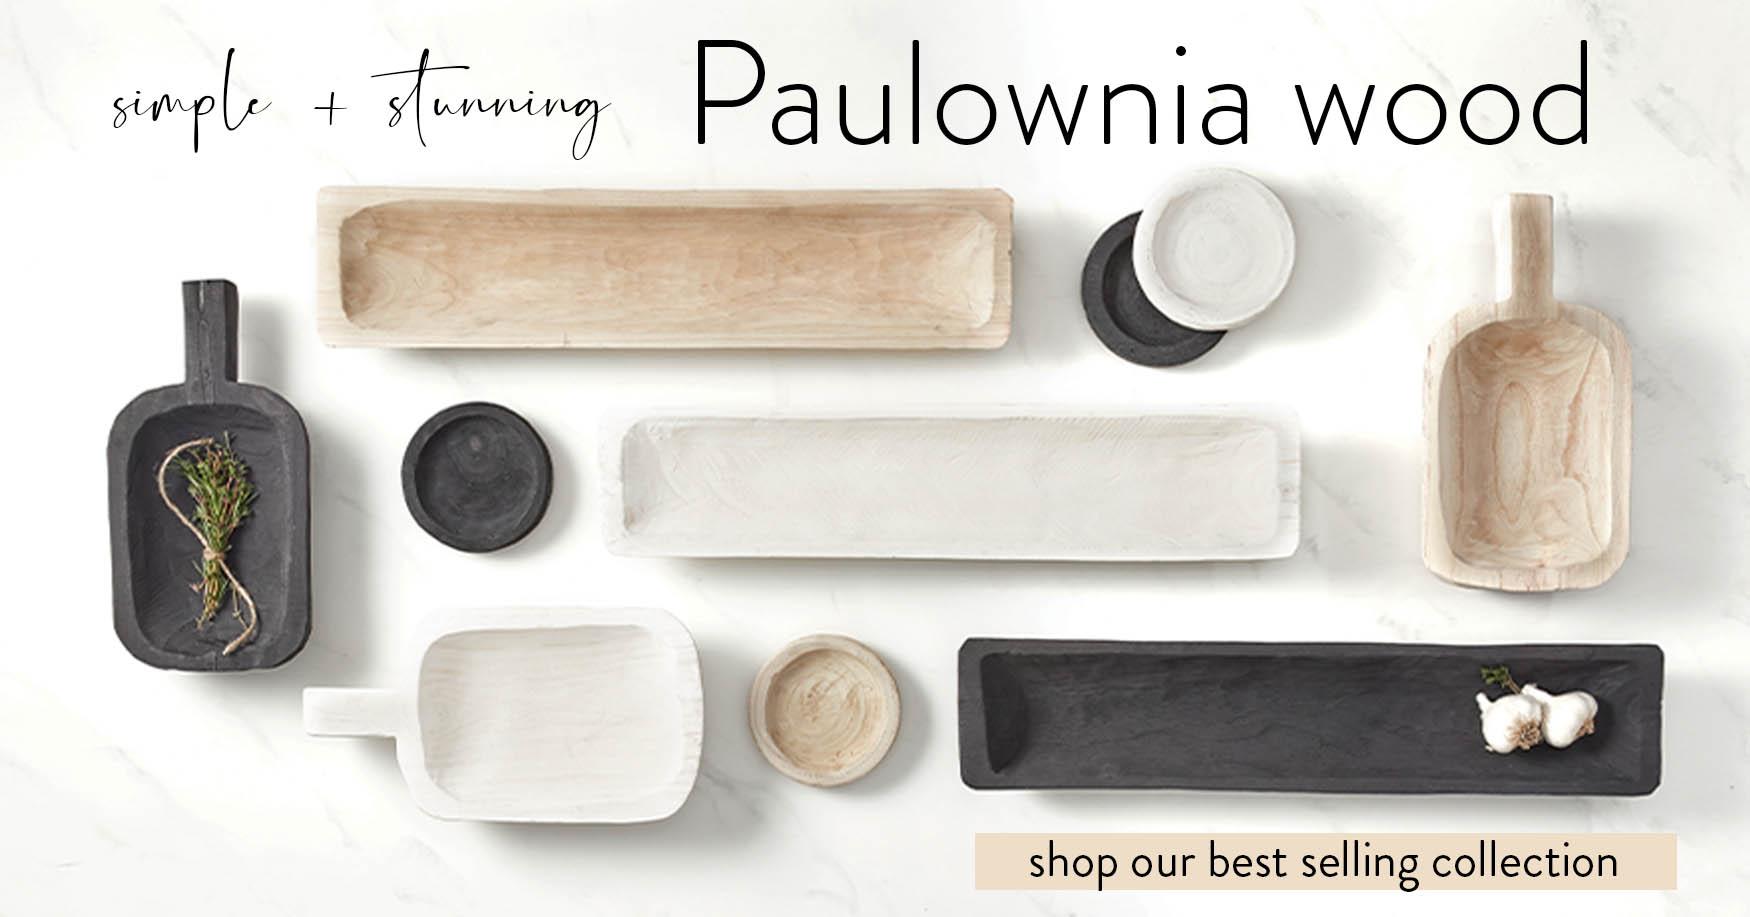 Shop Paulownia wood home products!